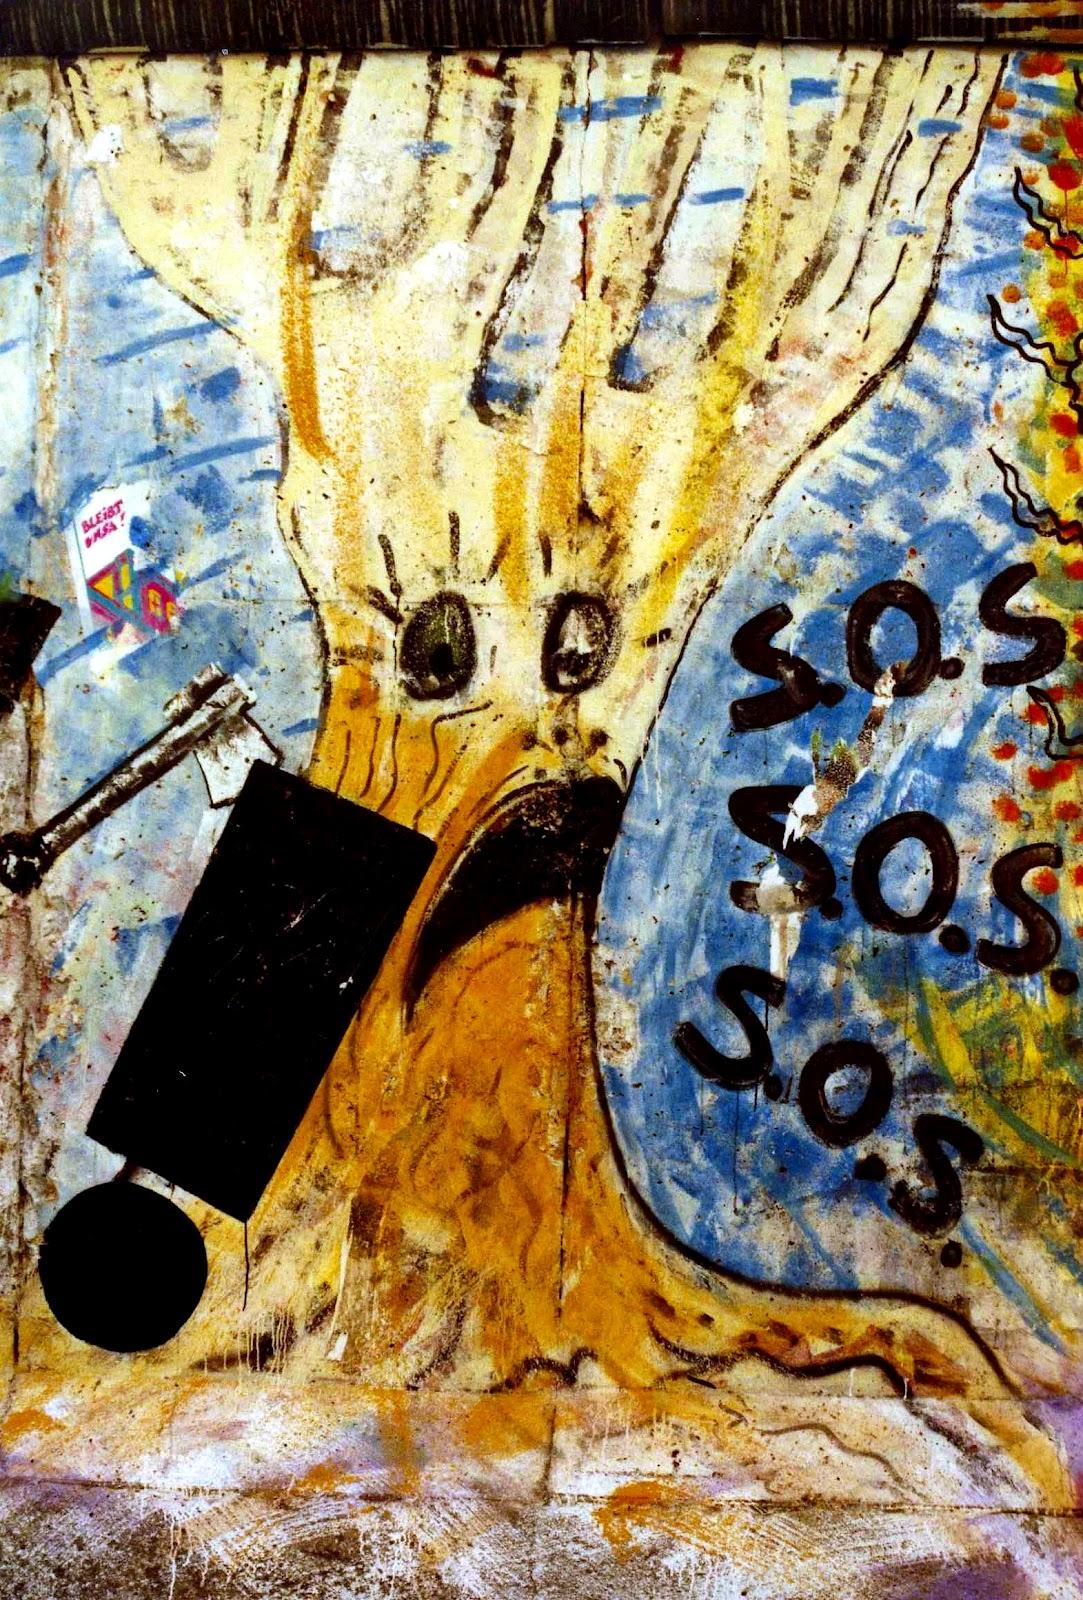 Berlin Wall - Indiano Art